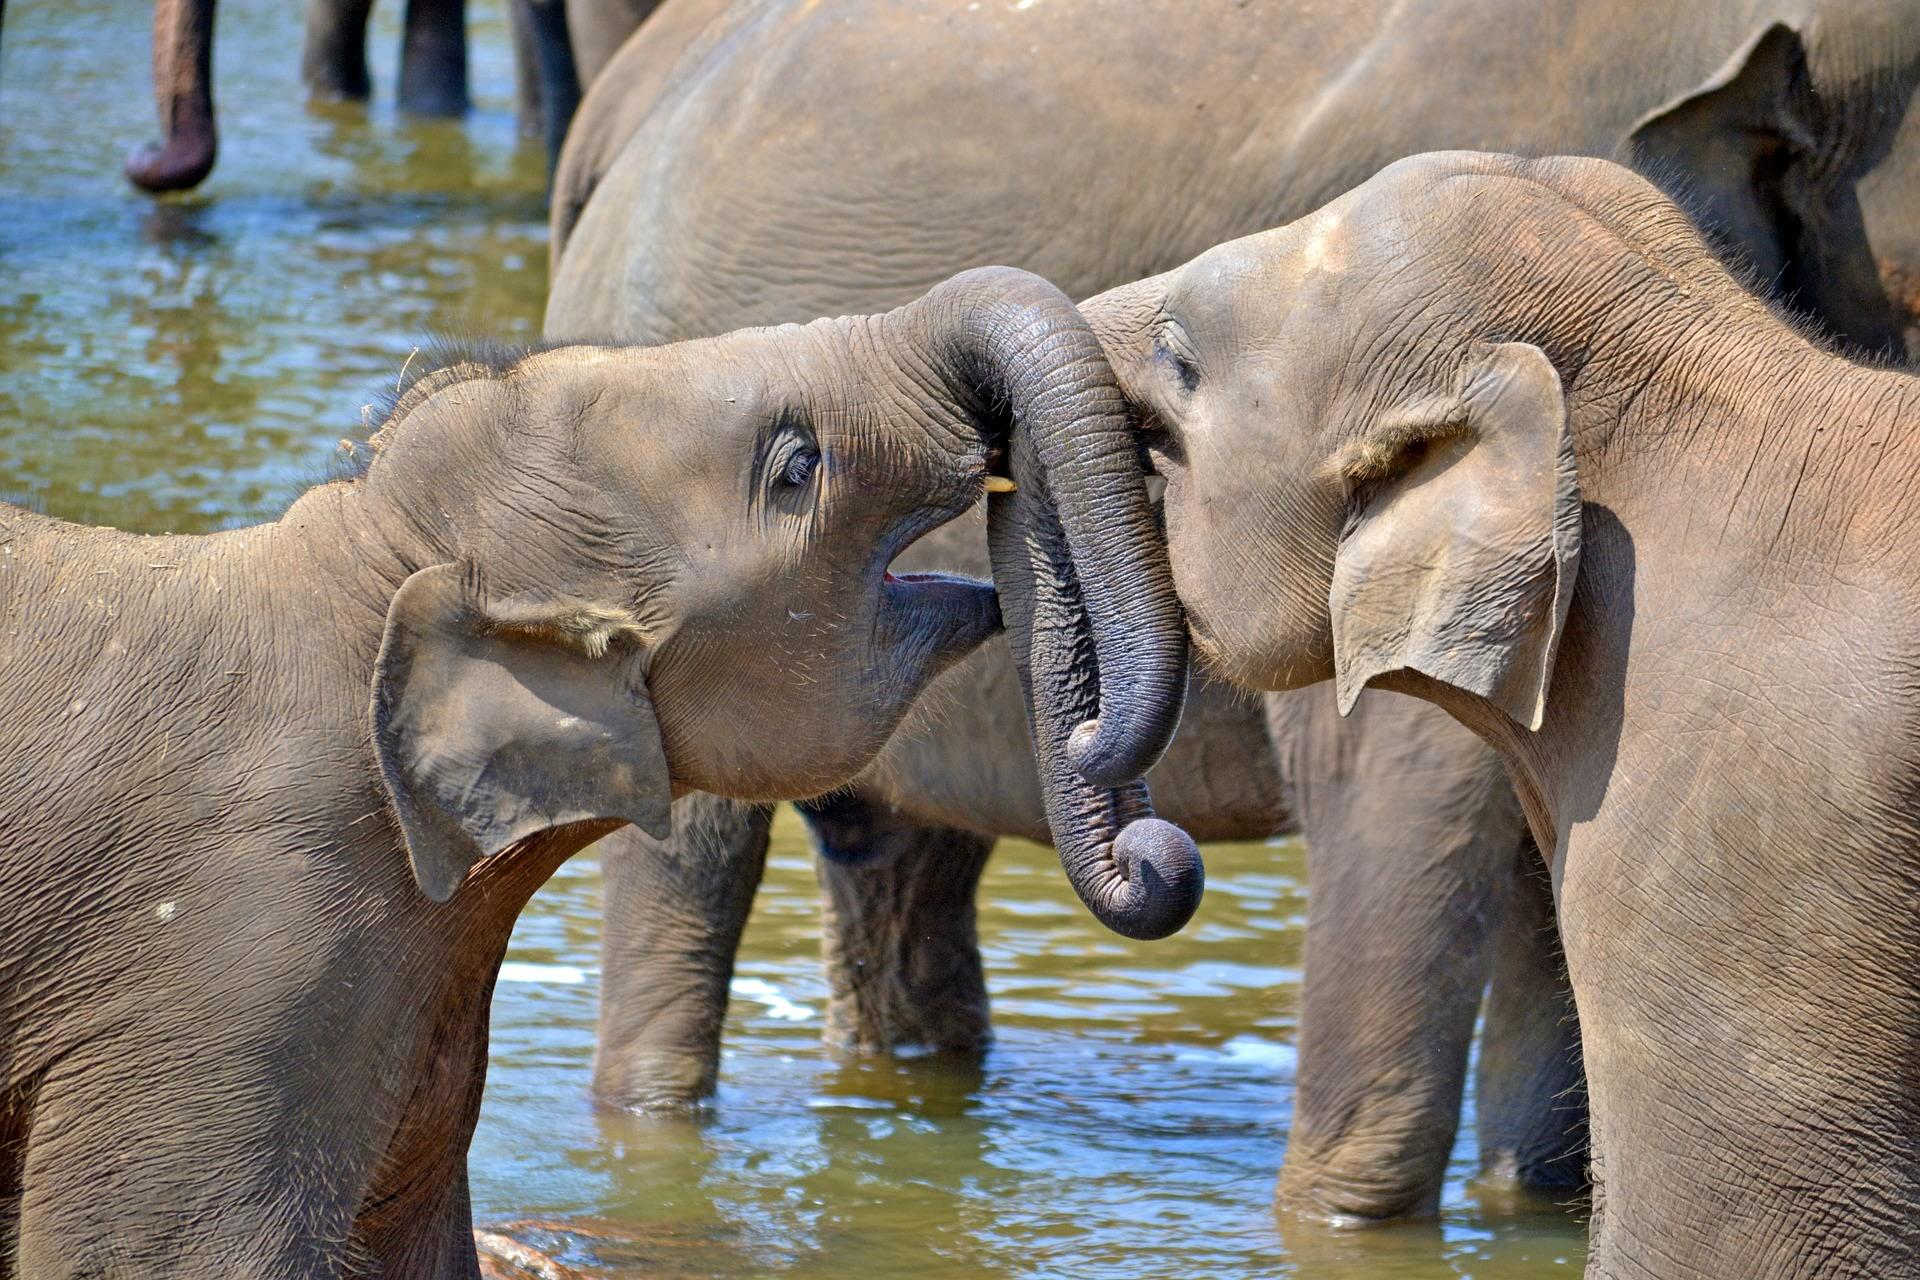 Visit the elephant orphanage in Pinnewela